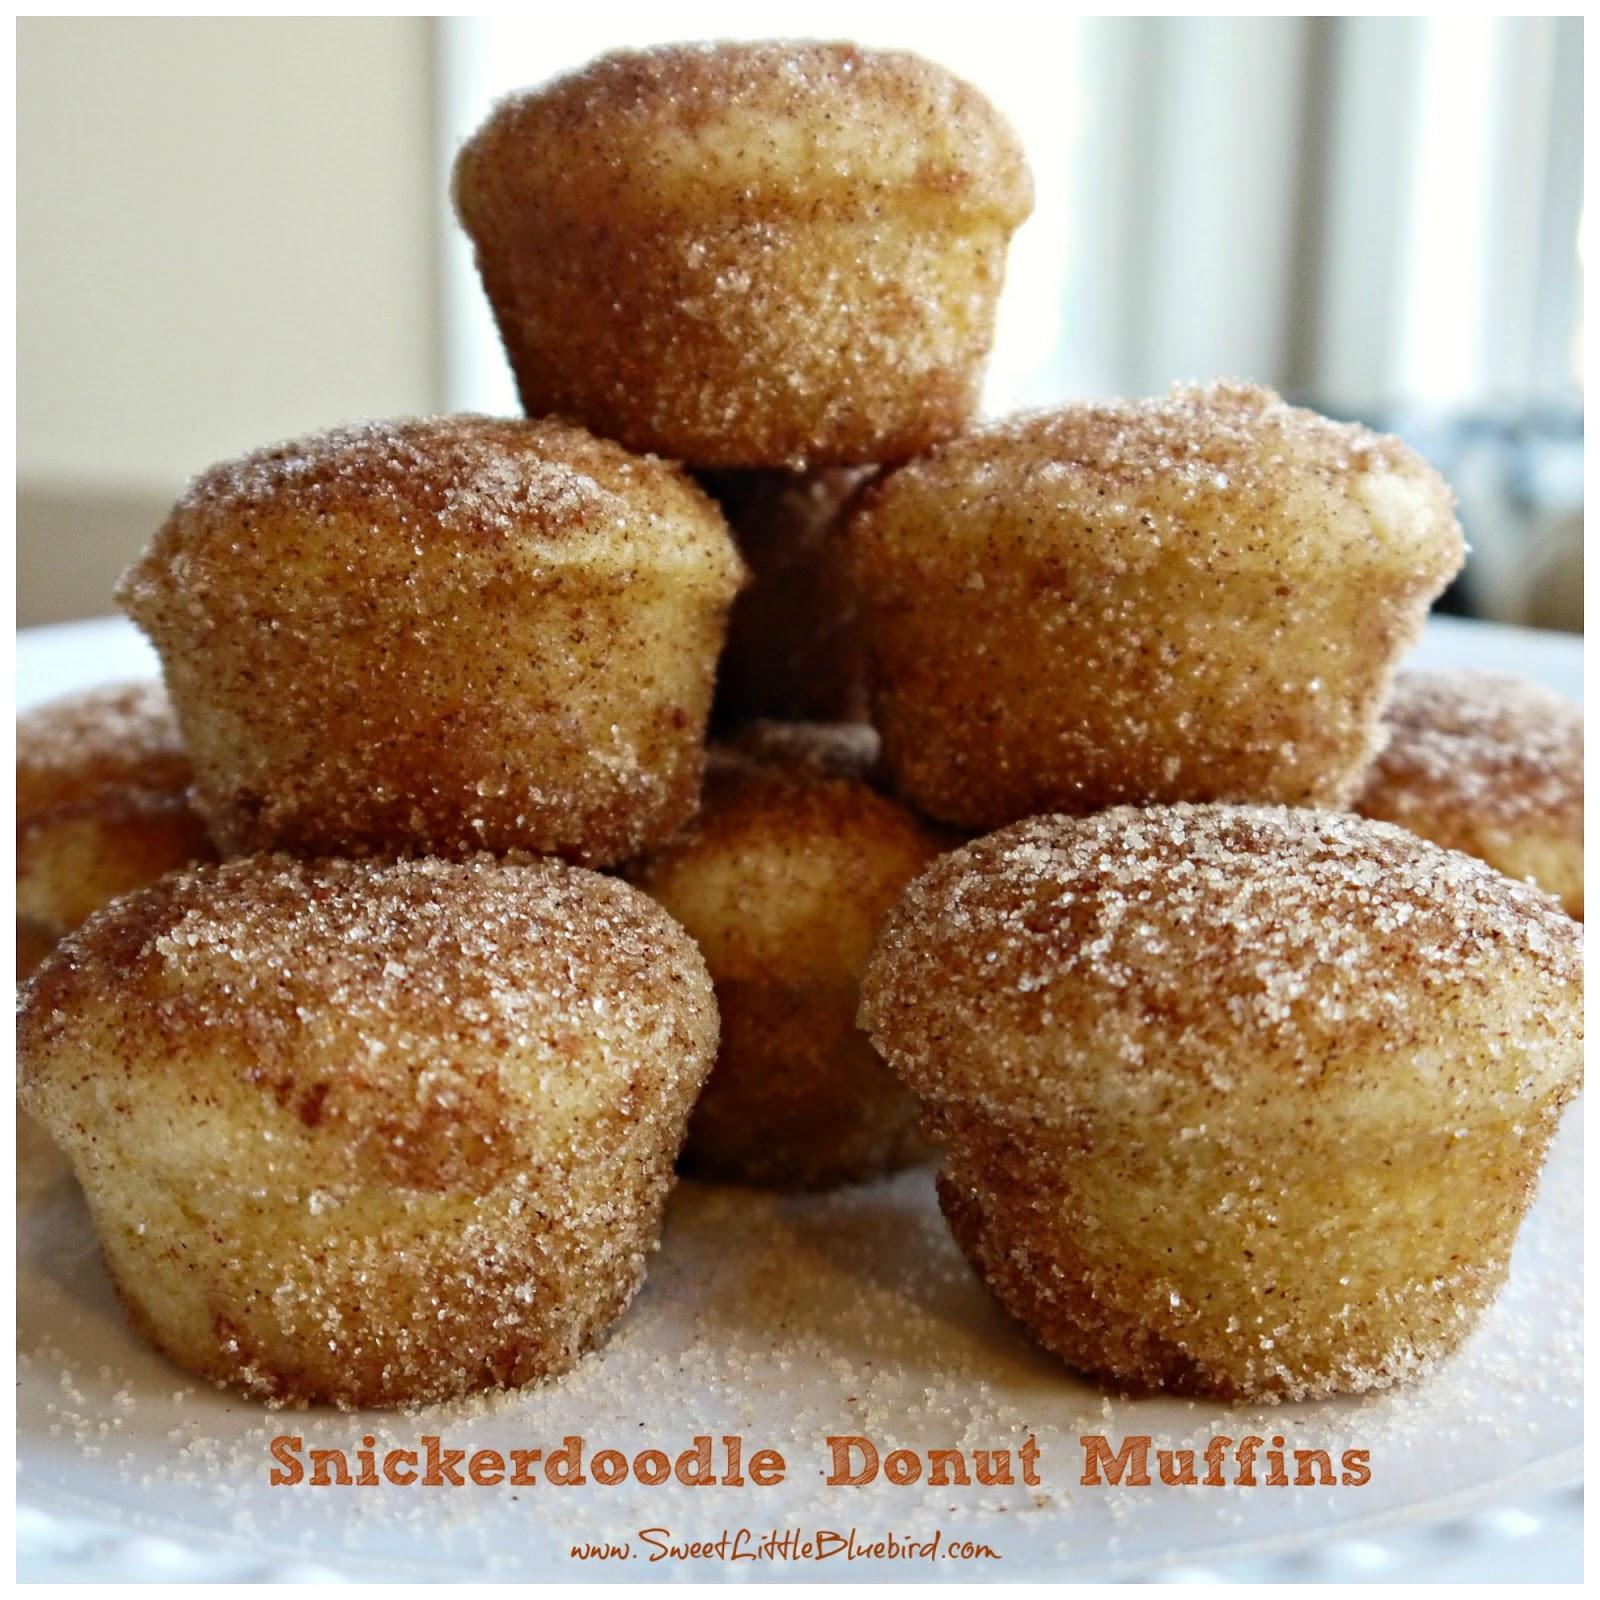 Sweet Little Bluebird: Snickerdoodle Donut Muffins